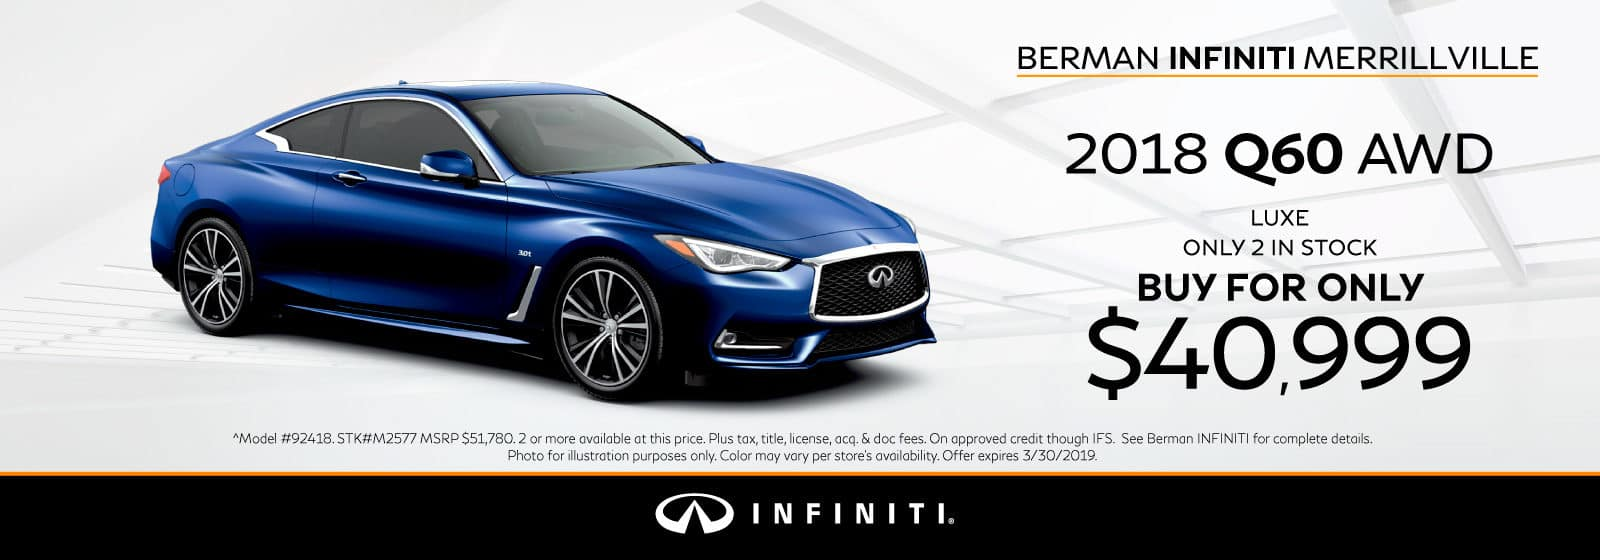 New 2018 INFINITI Q60 March Offer at Berman INFINITI of Merrillville!